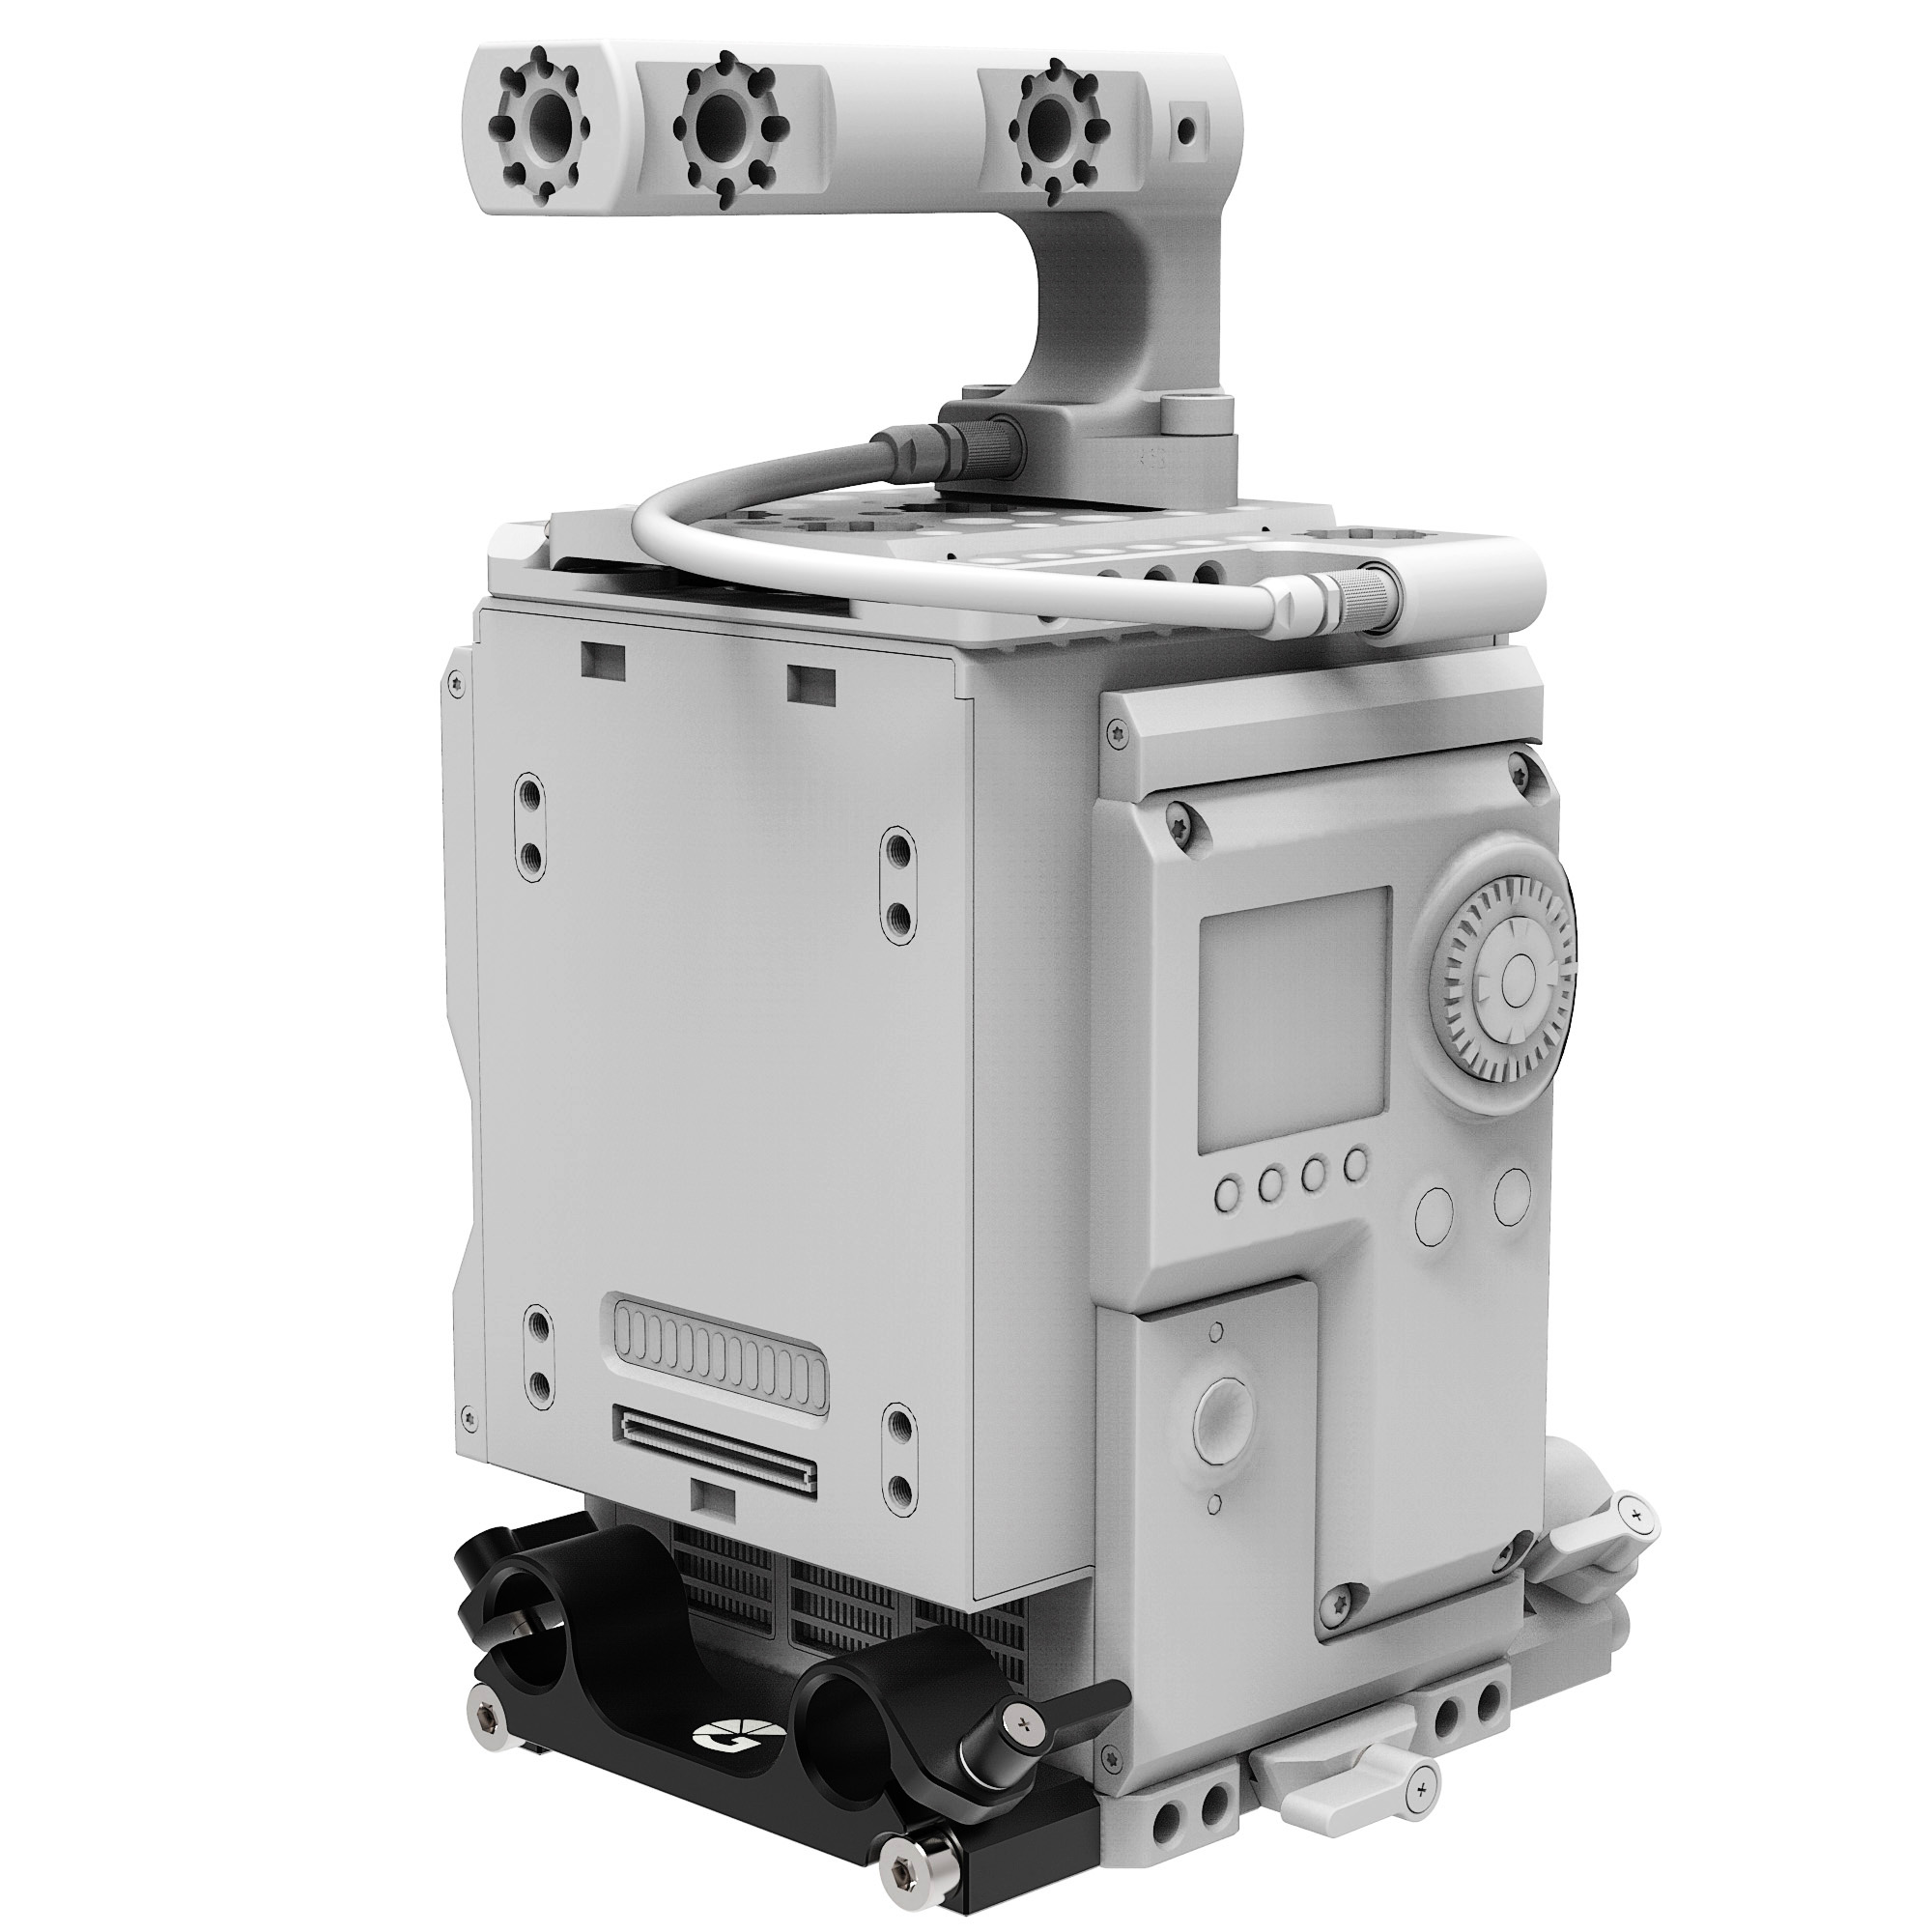 B4002 1003 15mm LWS mount for DSMC2 4 1